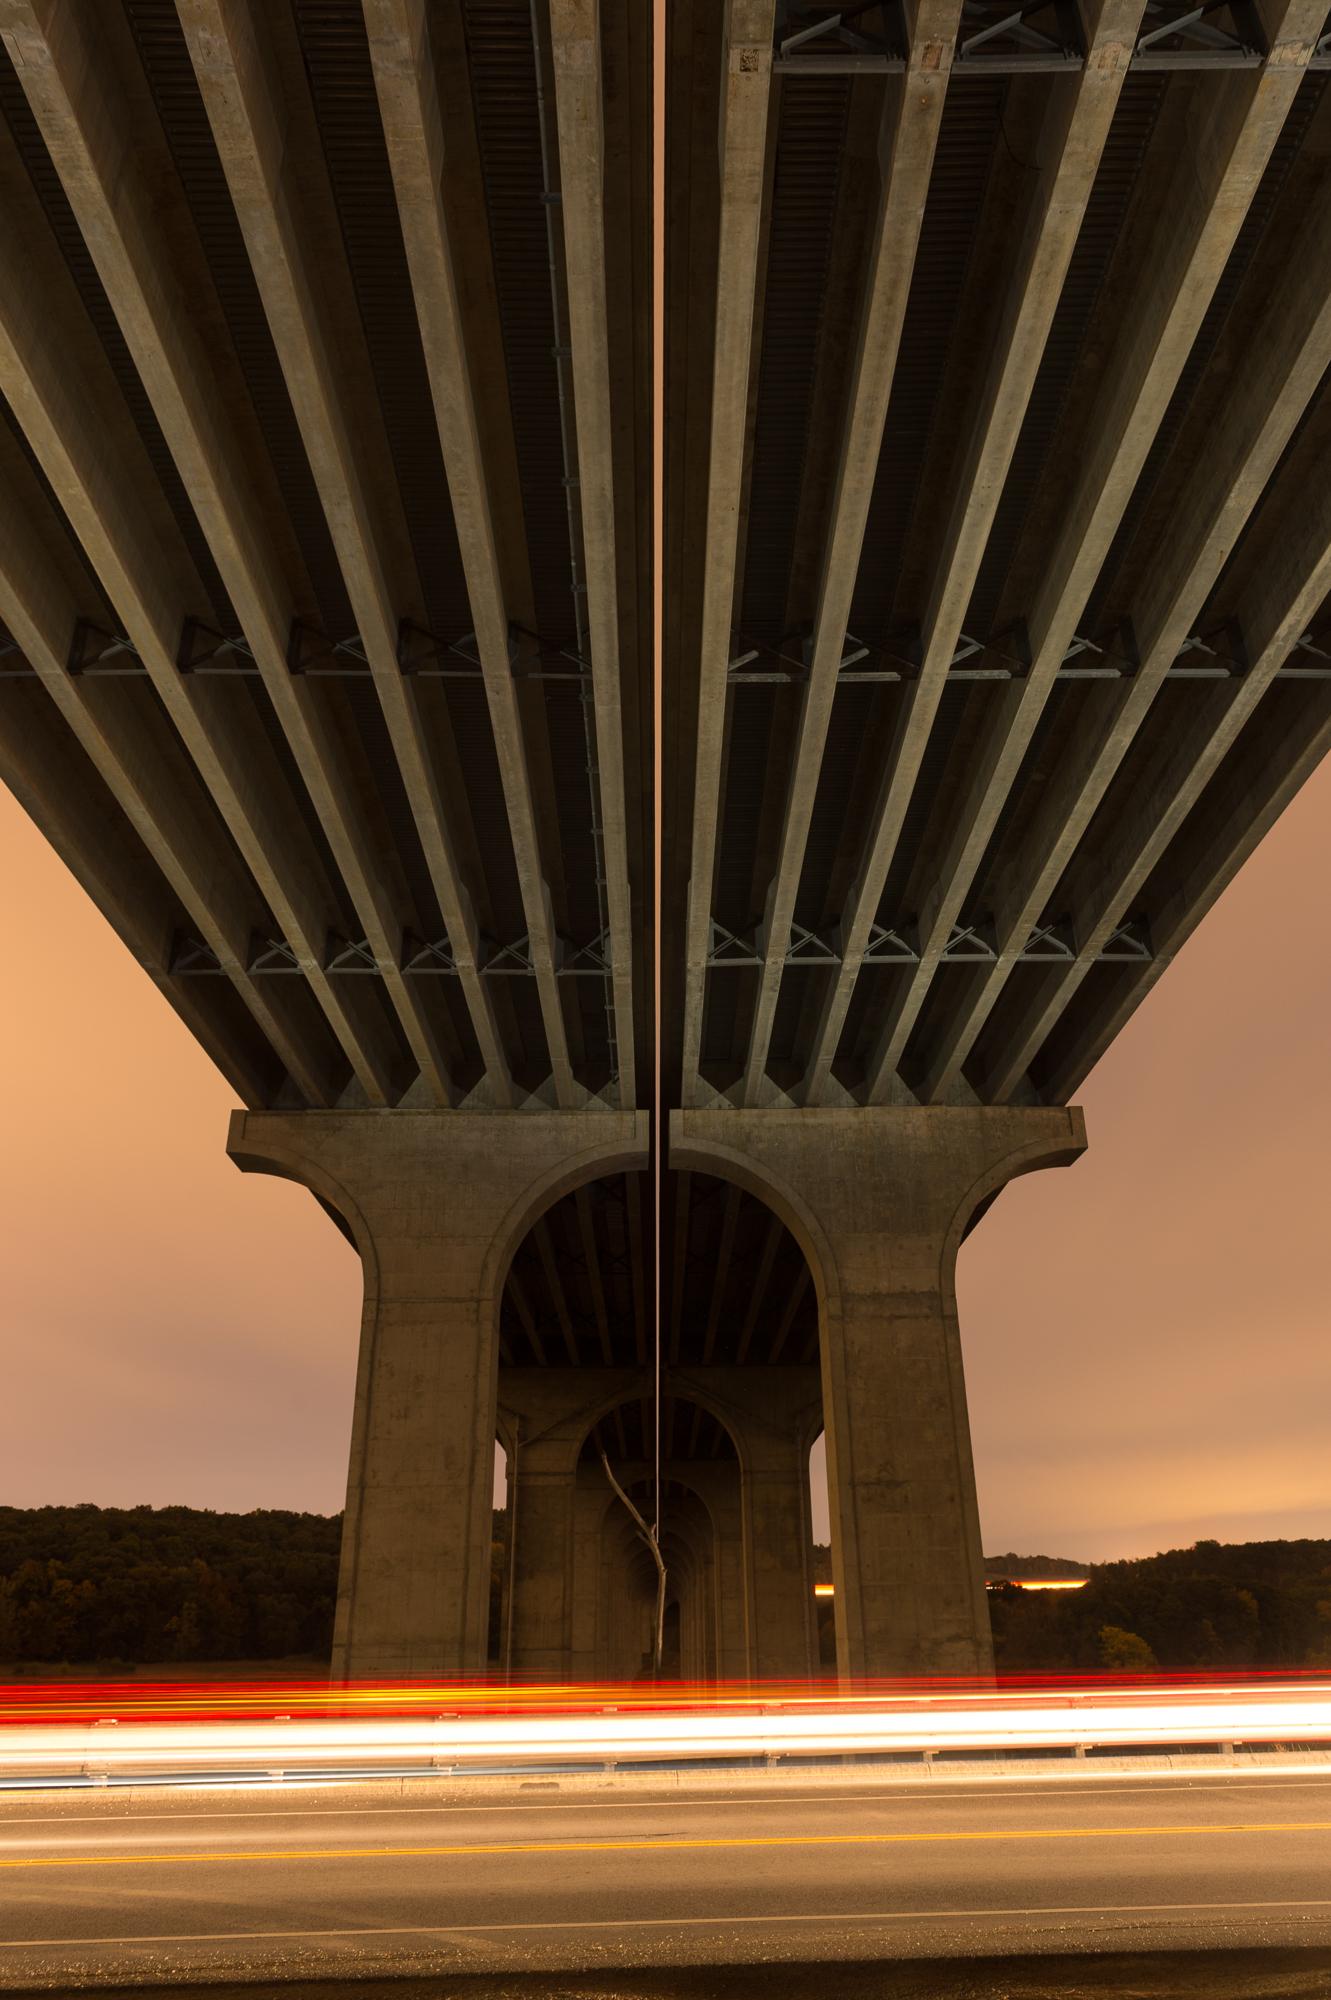 Figure 3: Light-painting underside of the bridge